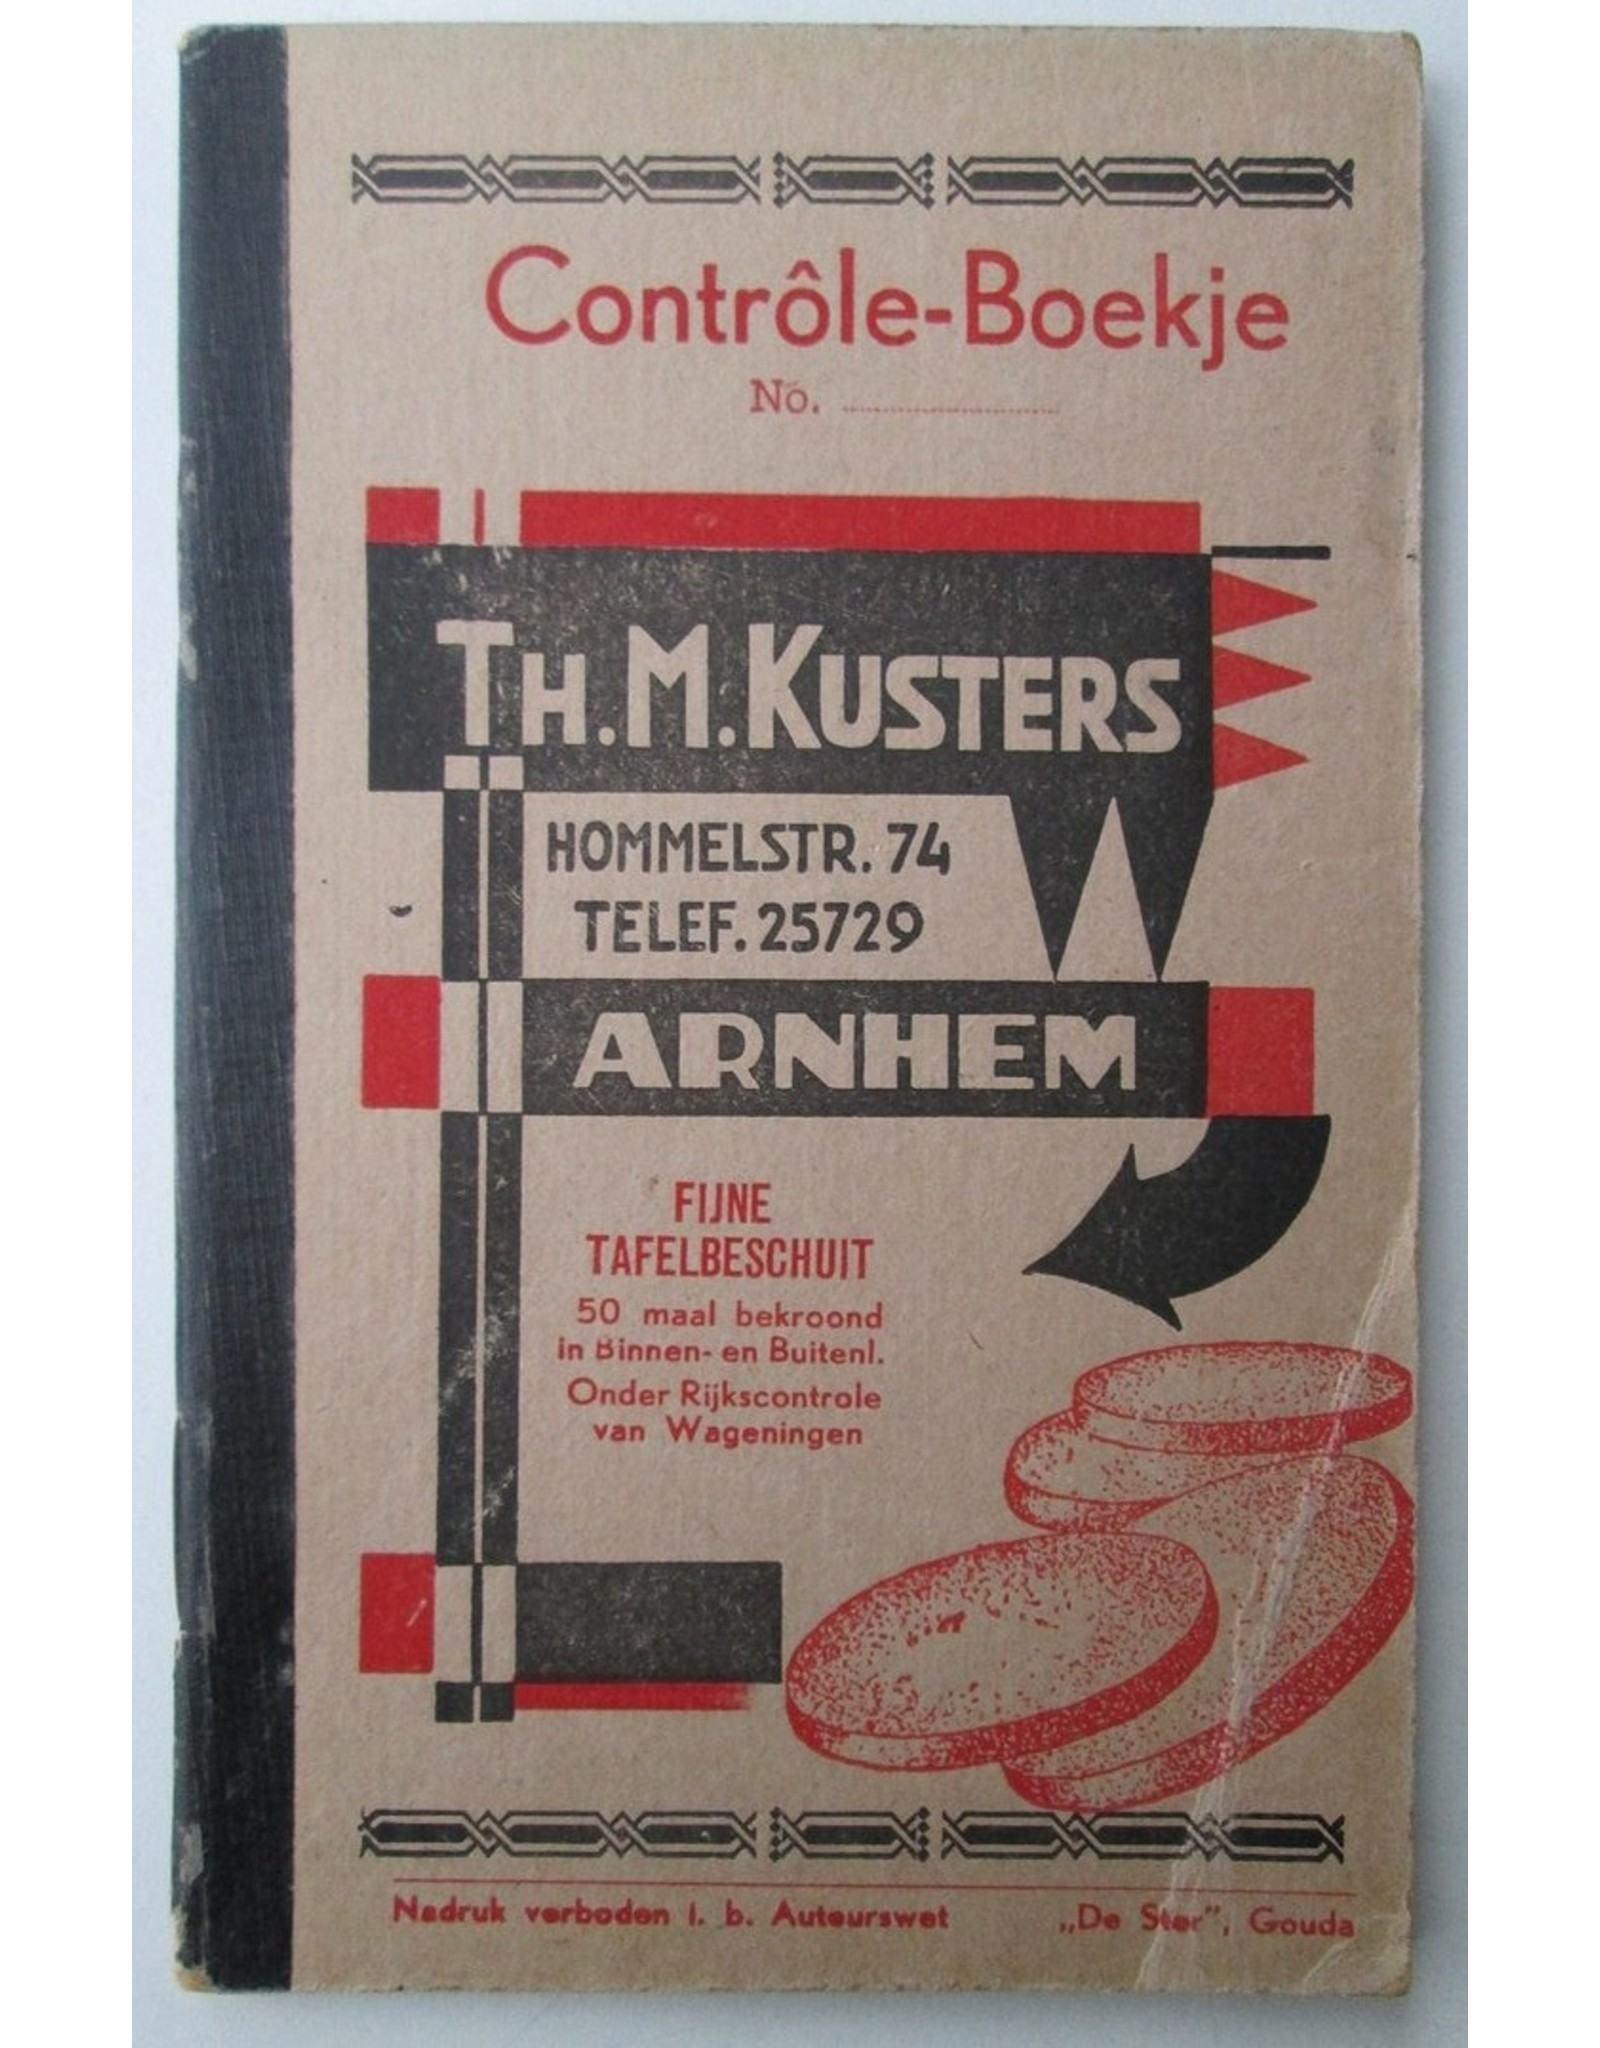 [Sinterklaas] Contrôle-Boekje No. - Th. M. Kusters Hommelstr. 74 Arnhem